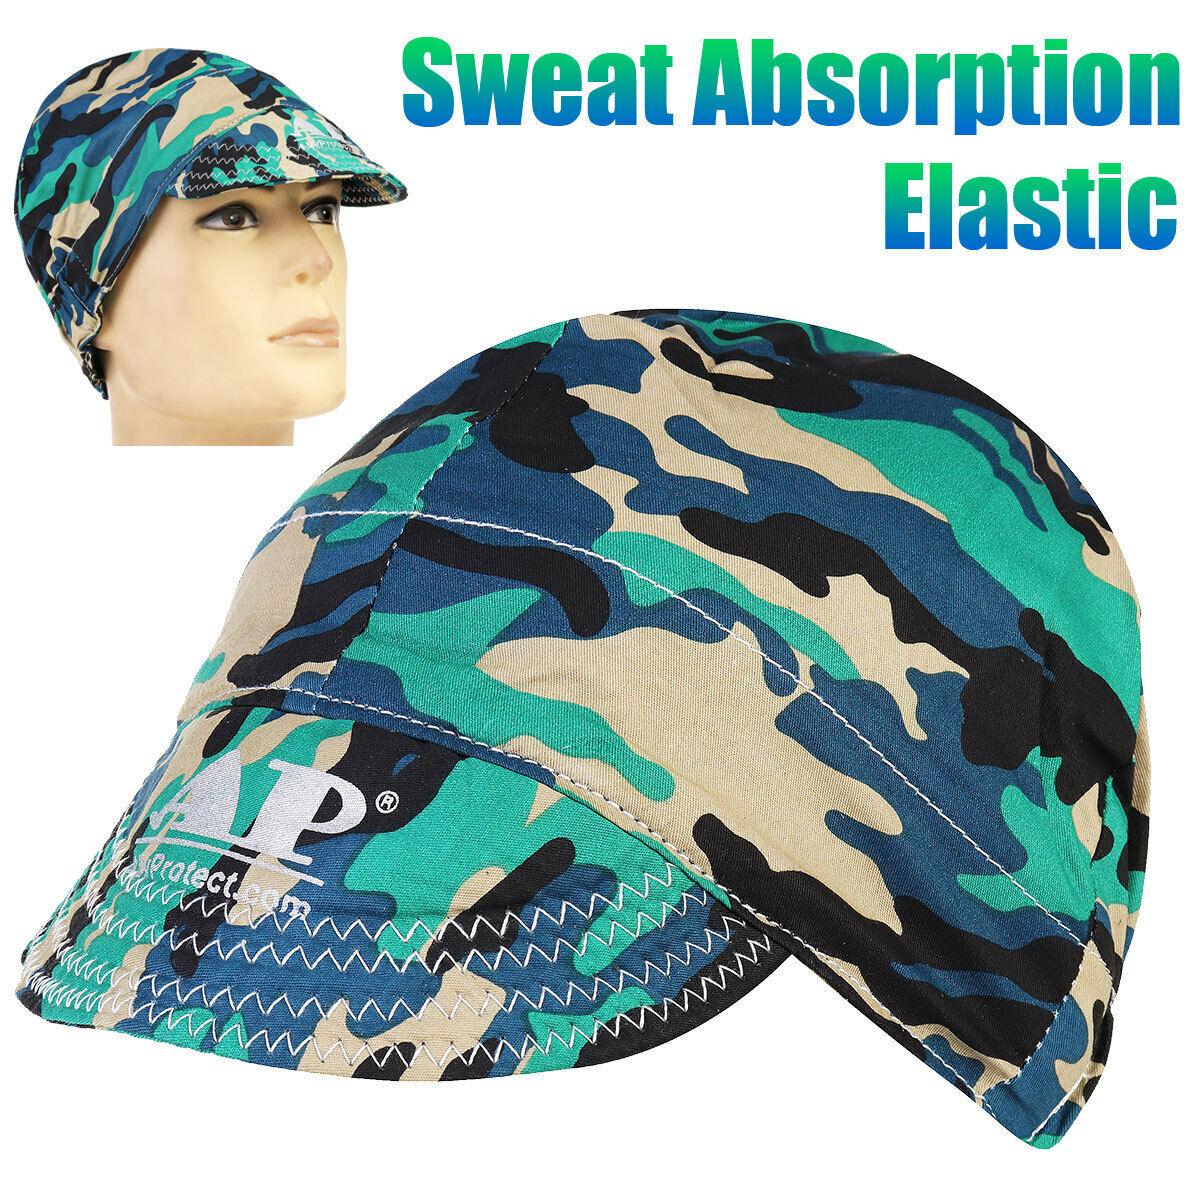 Welding Welder Hat Cap Protective Comeaux Scarf Flame Retardant Cotton Helmet